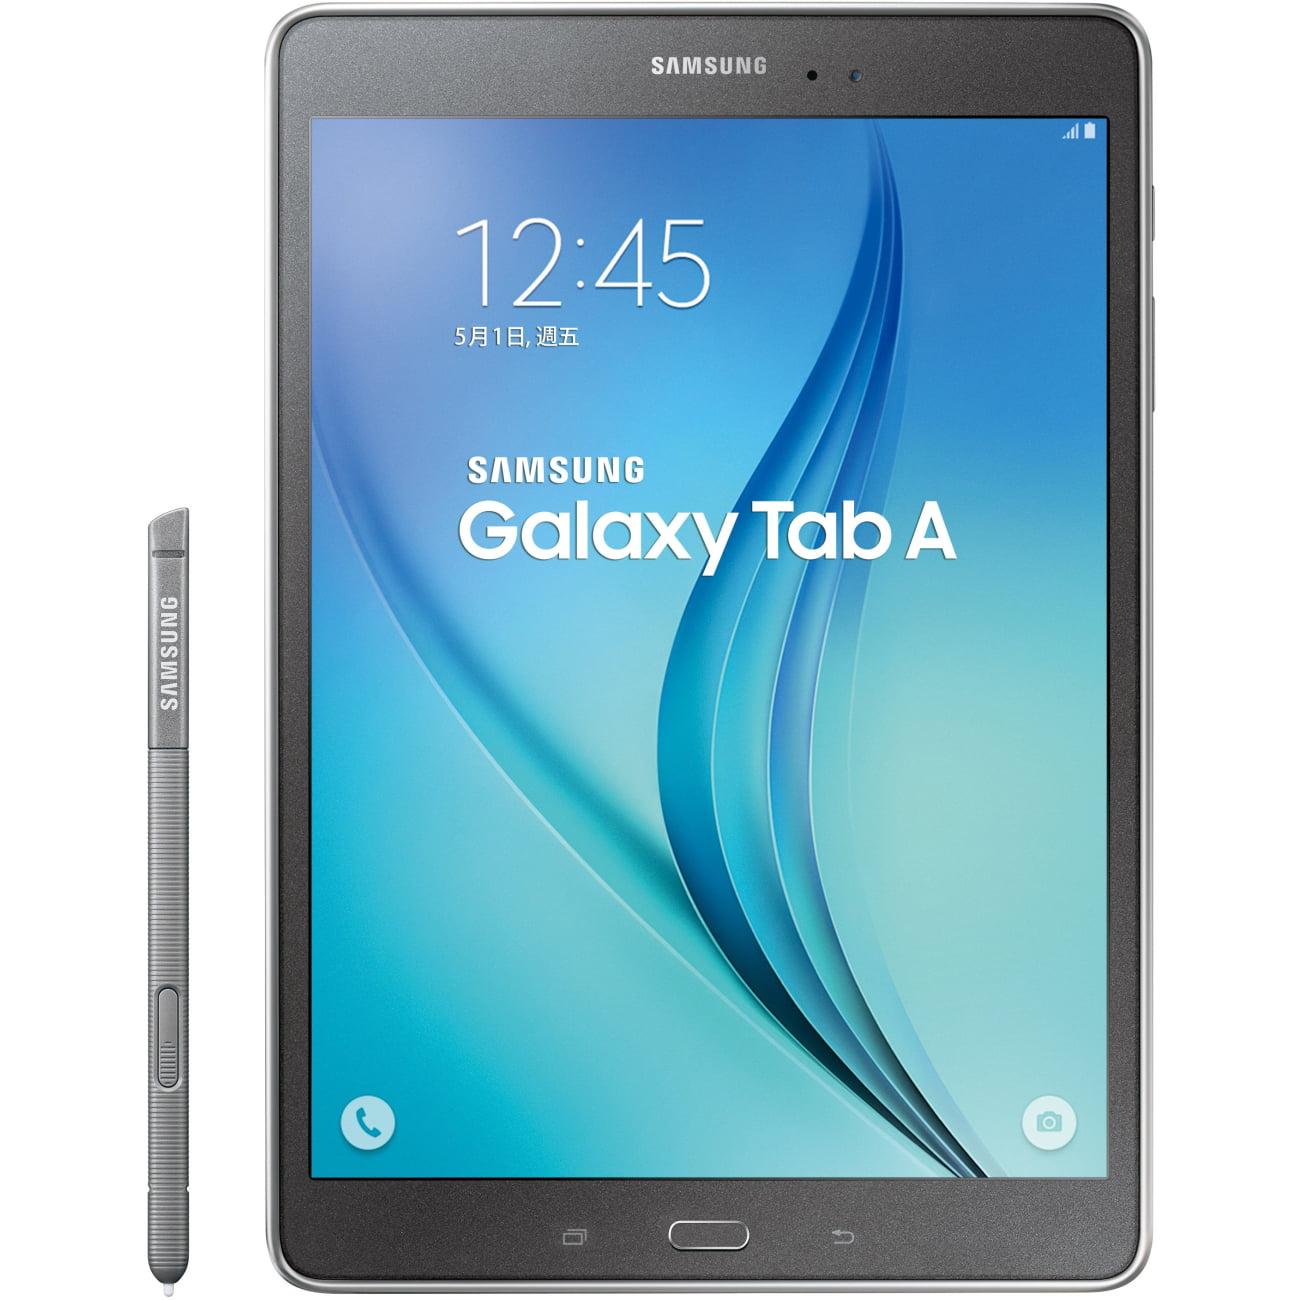 Samsung Galaxy Tab A Sm-p550 16 Gb Tablet - 9.7\